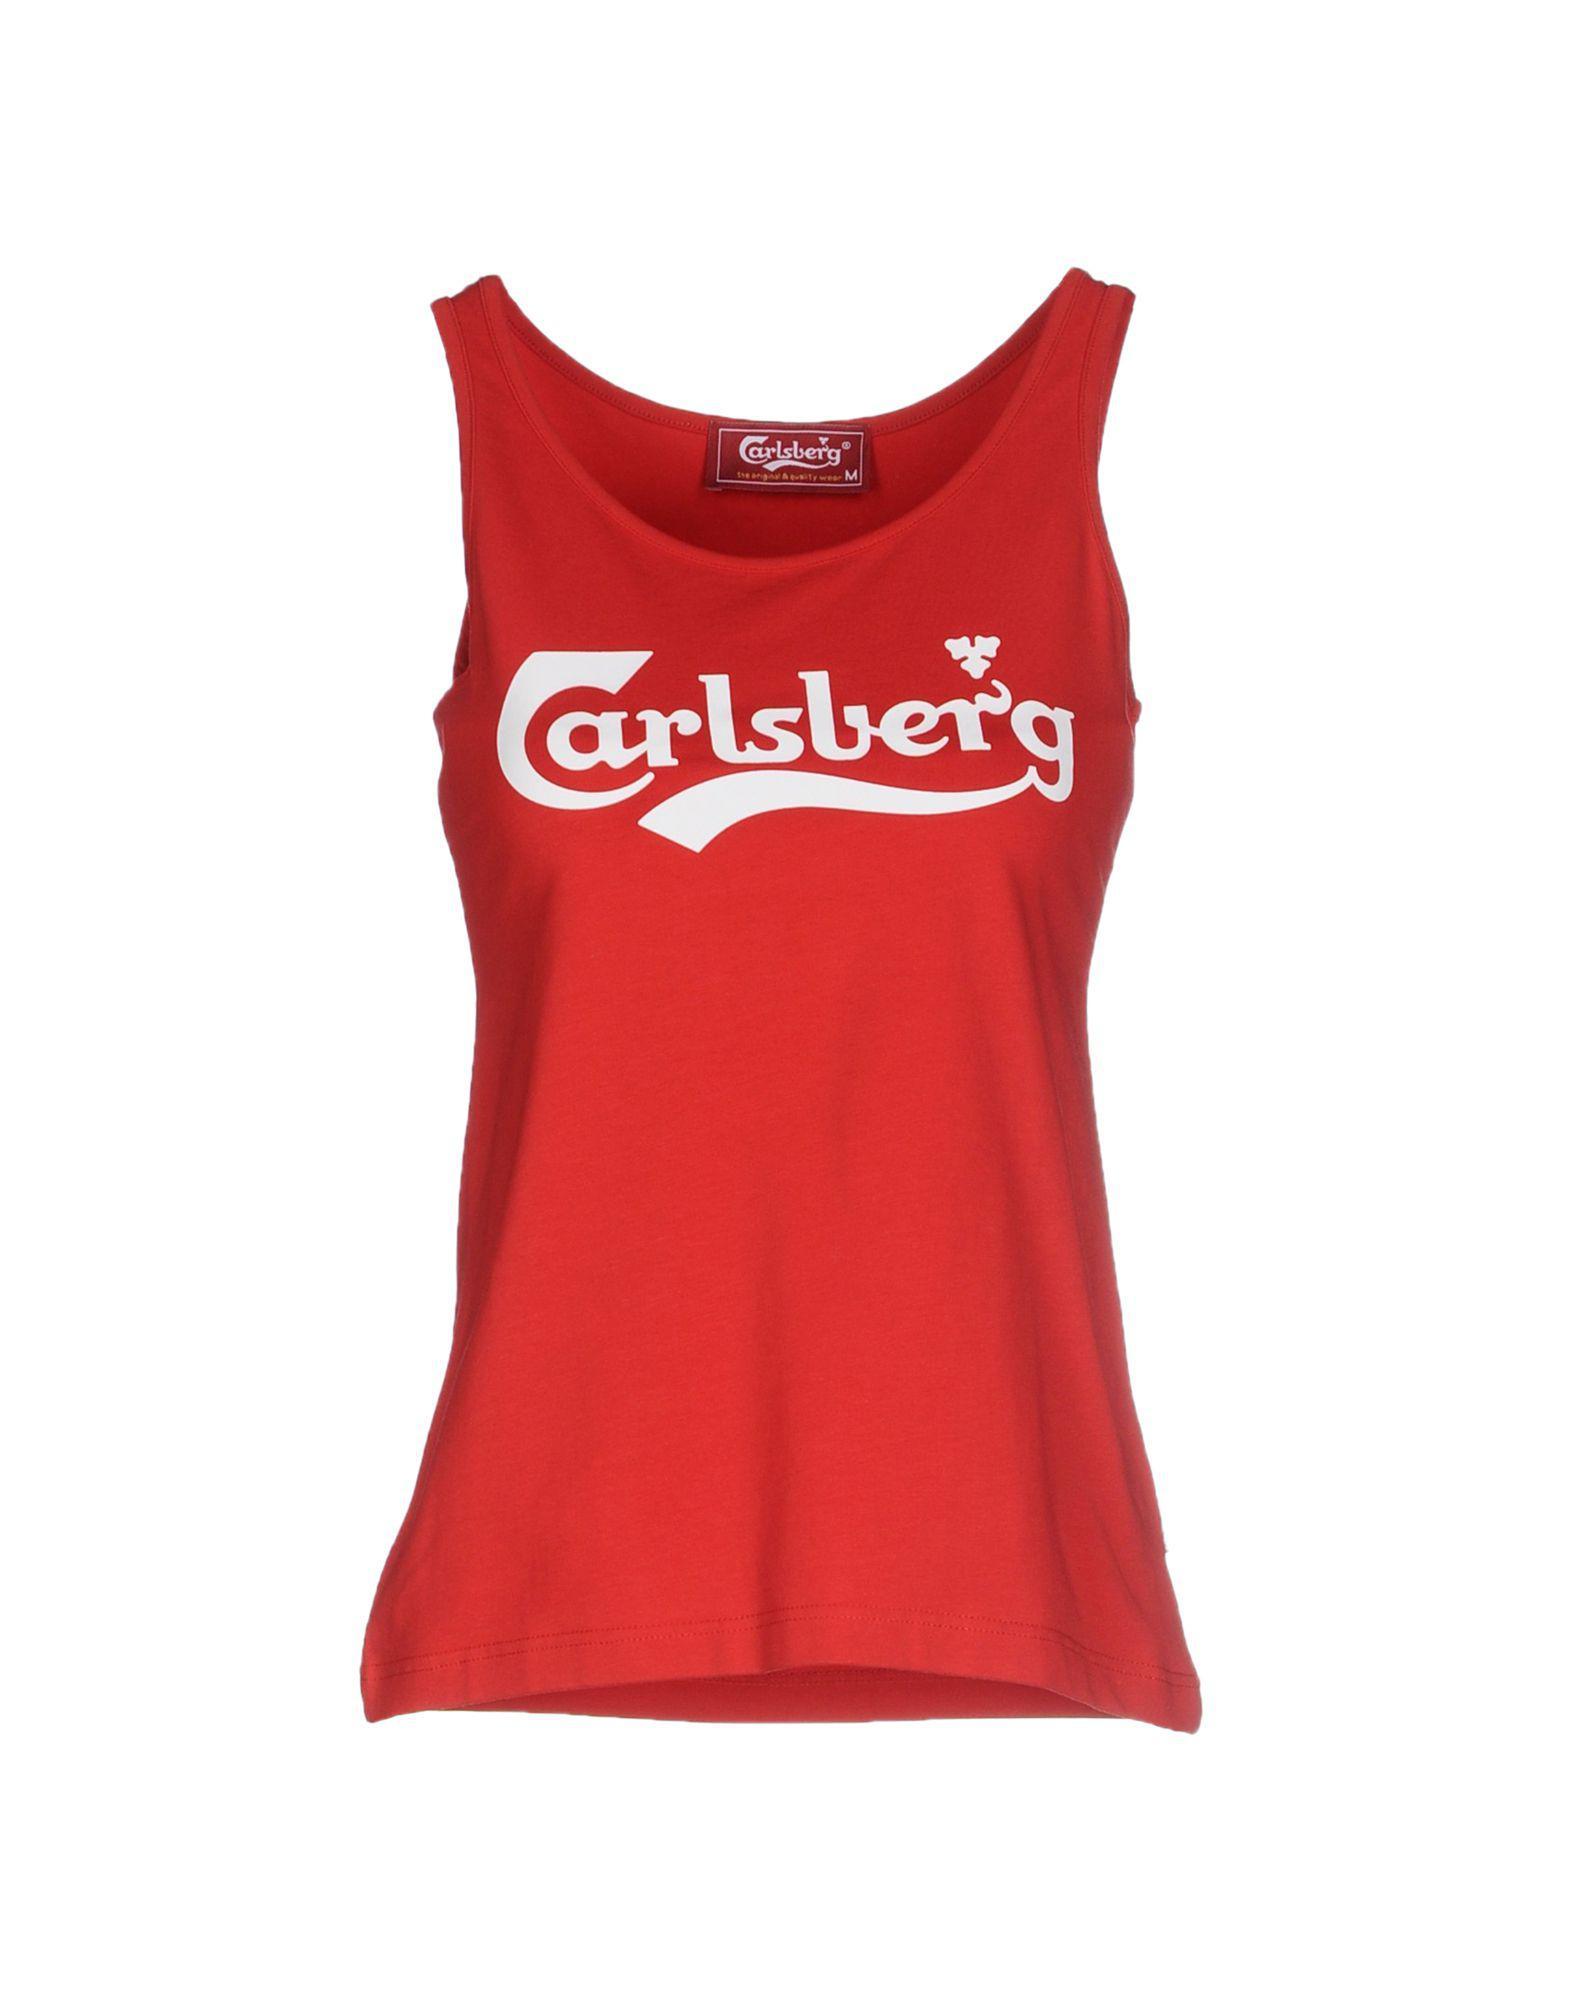 Color De Tirantes Camiseta Carlsberg Lyst Rojo WpcRYqxS